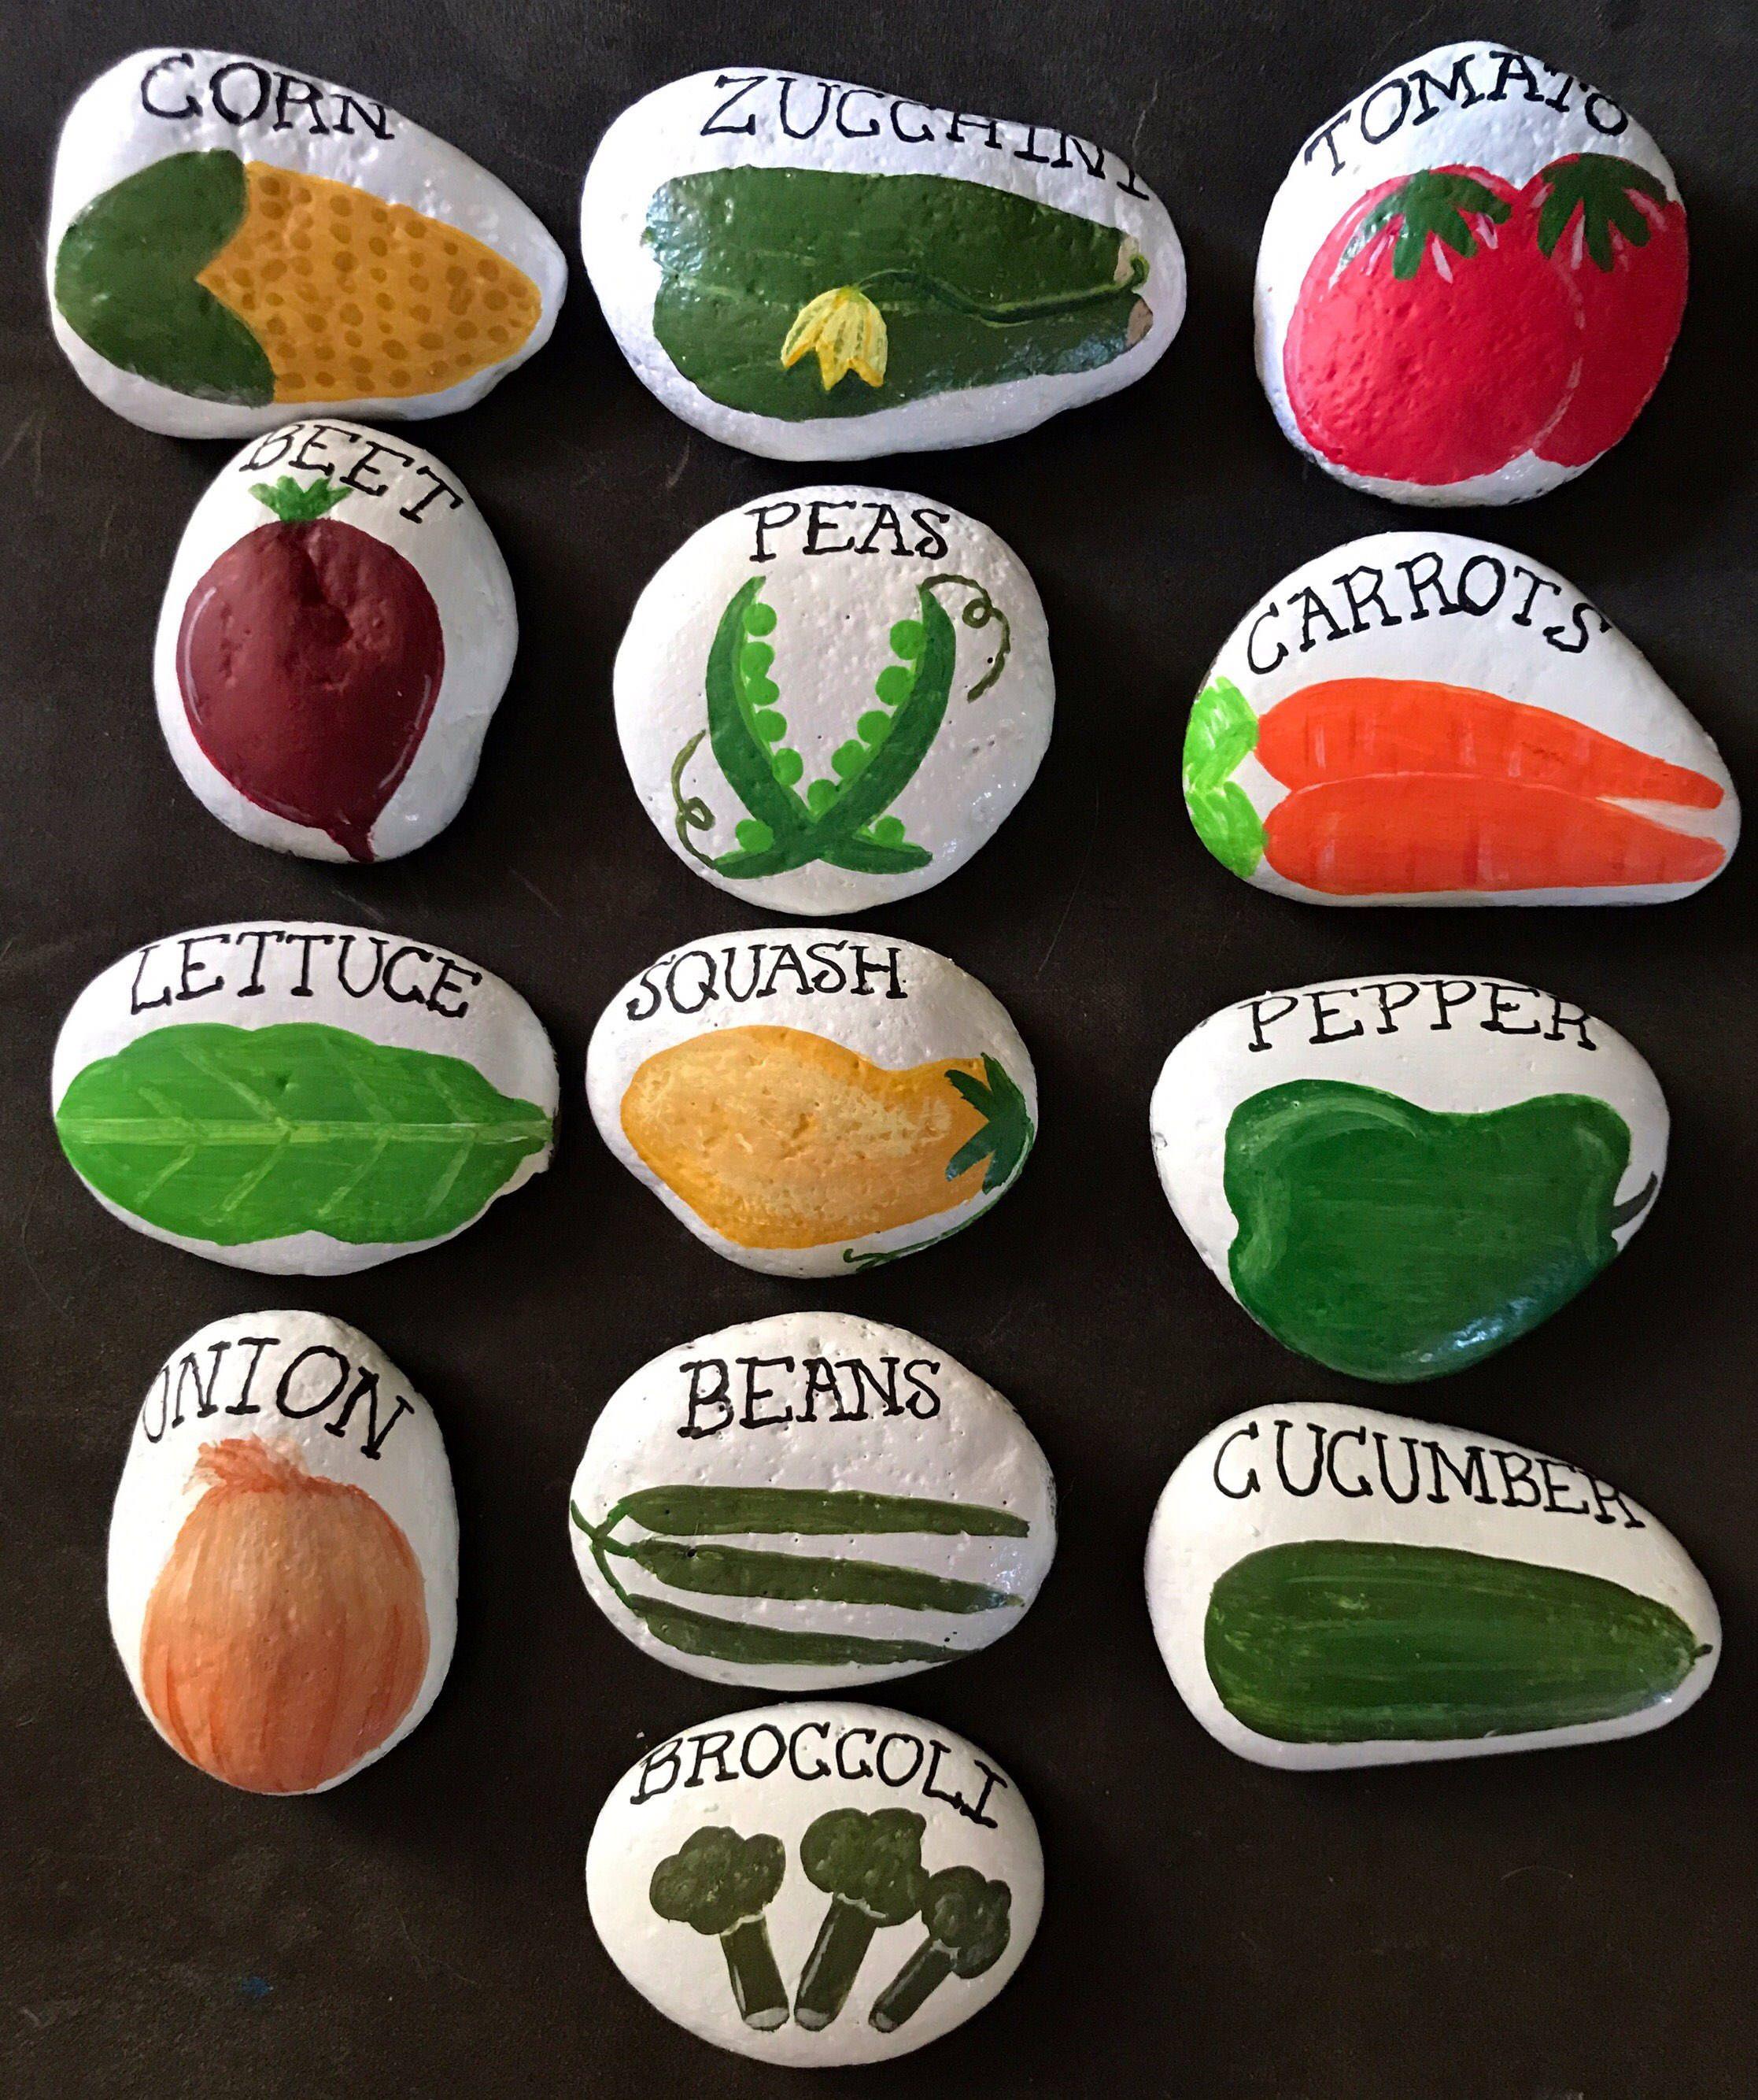 Set 13 Vegetable Garden Stone Marker Painted Rocks Vegetables